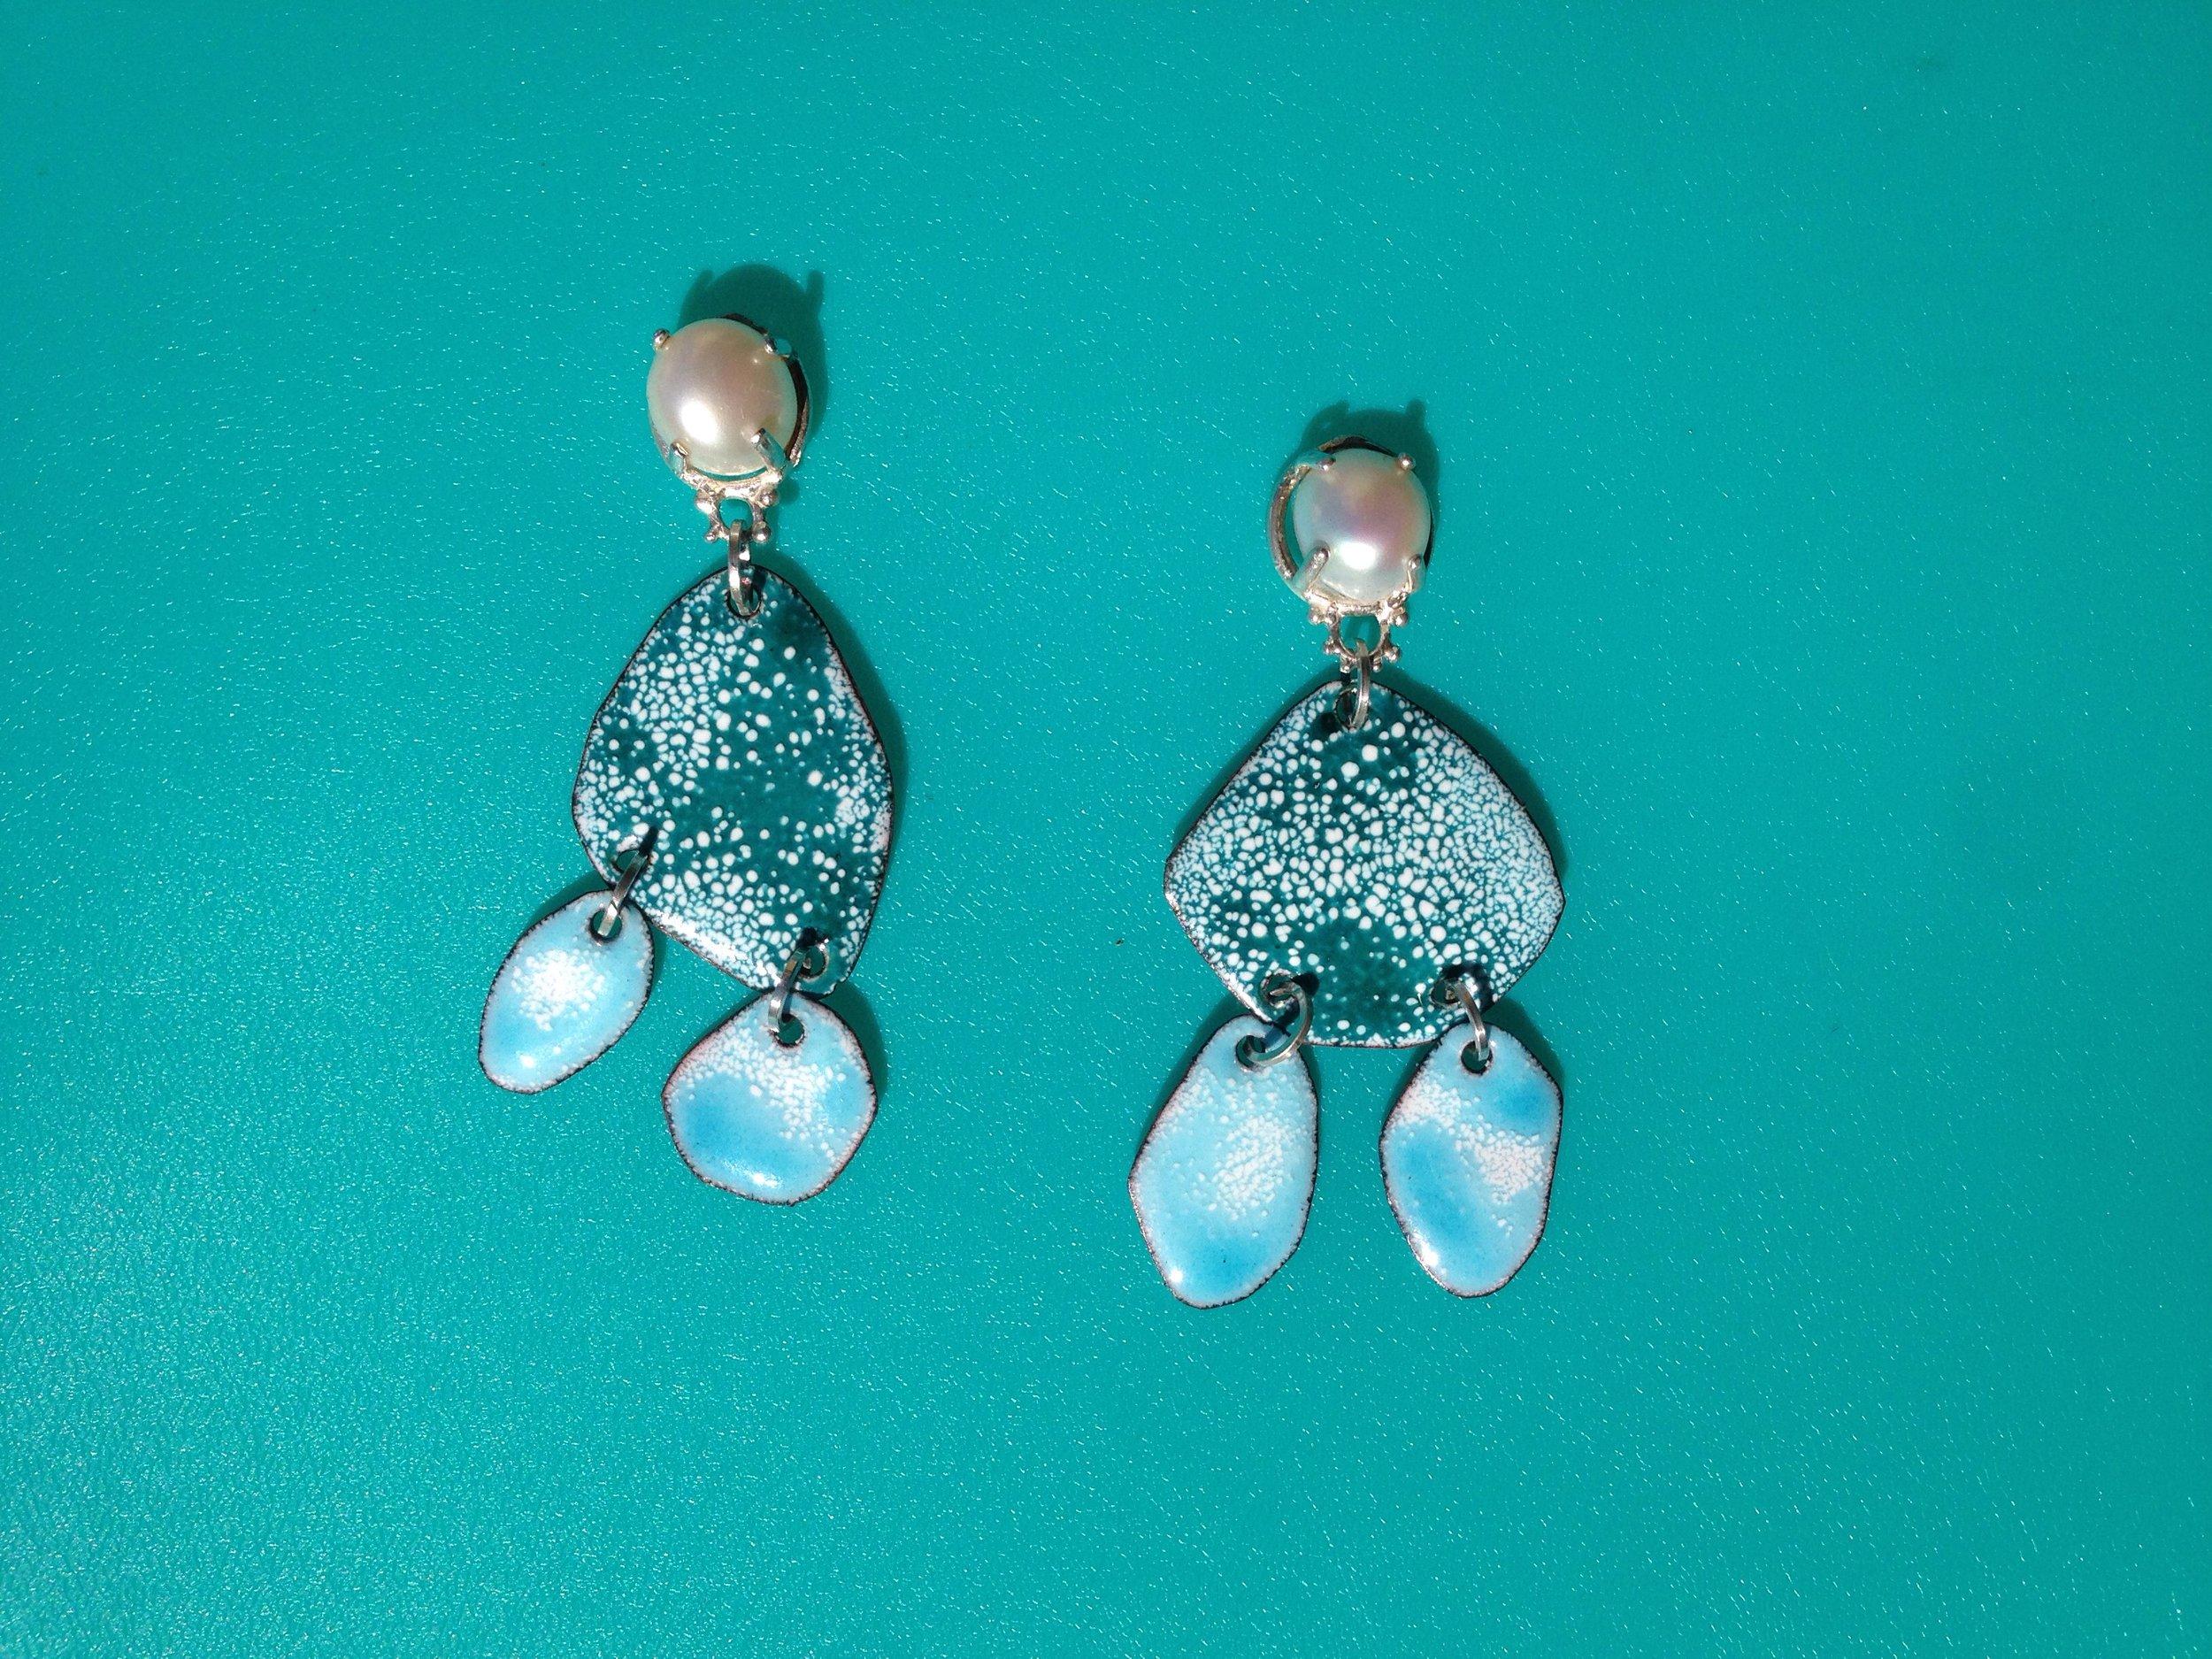 ada-hodgson-contemporary-australian-jewellery-designer-jeweller-design-handmade-mebourne-custom-engagement-wedding-enamel-sterling-jewelry-statement-ring-earrings-handcrafted-unique-bespoke.JPG